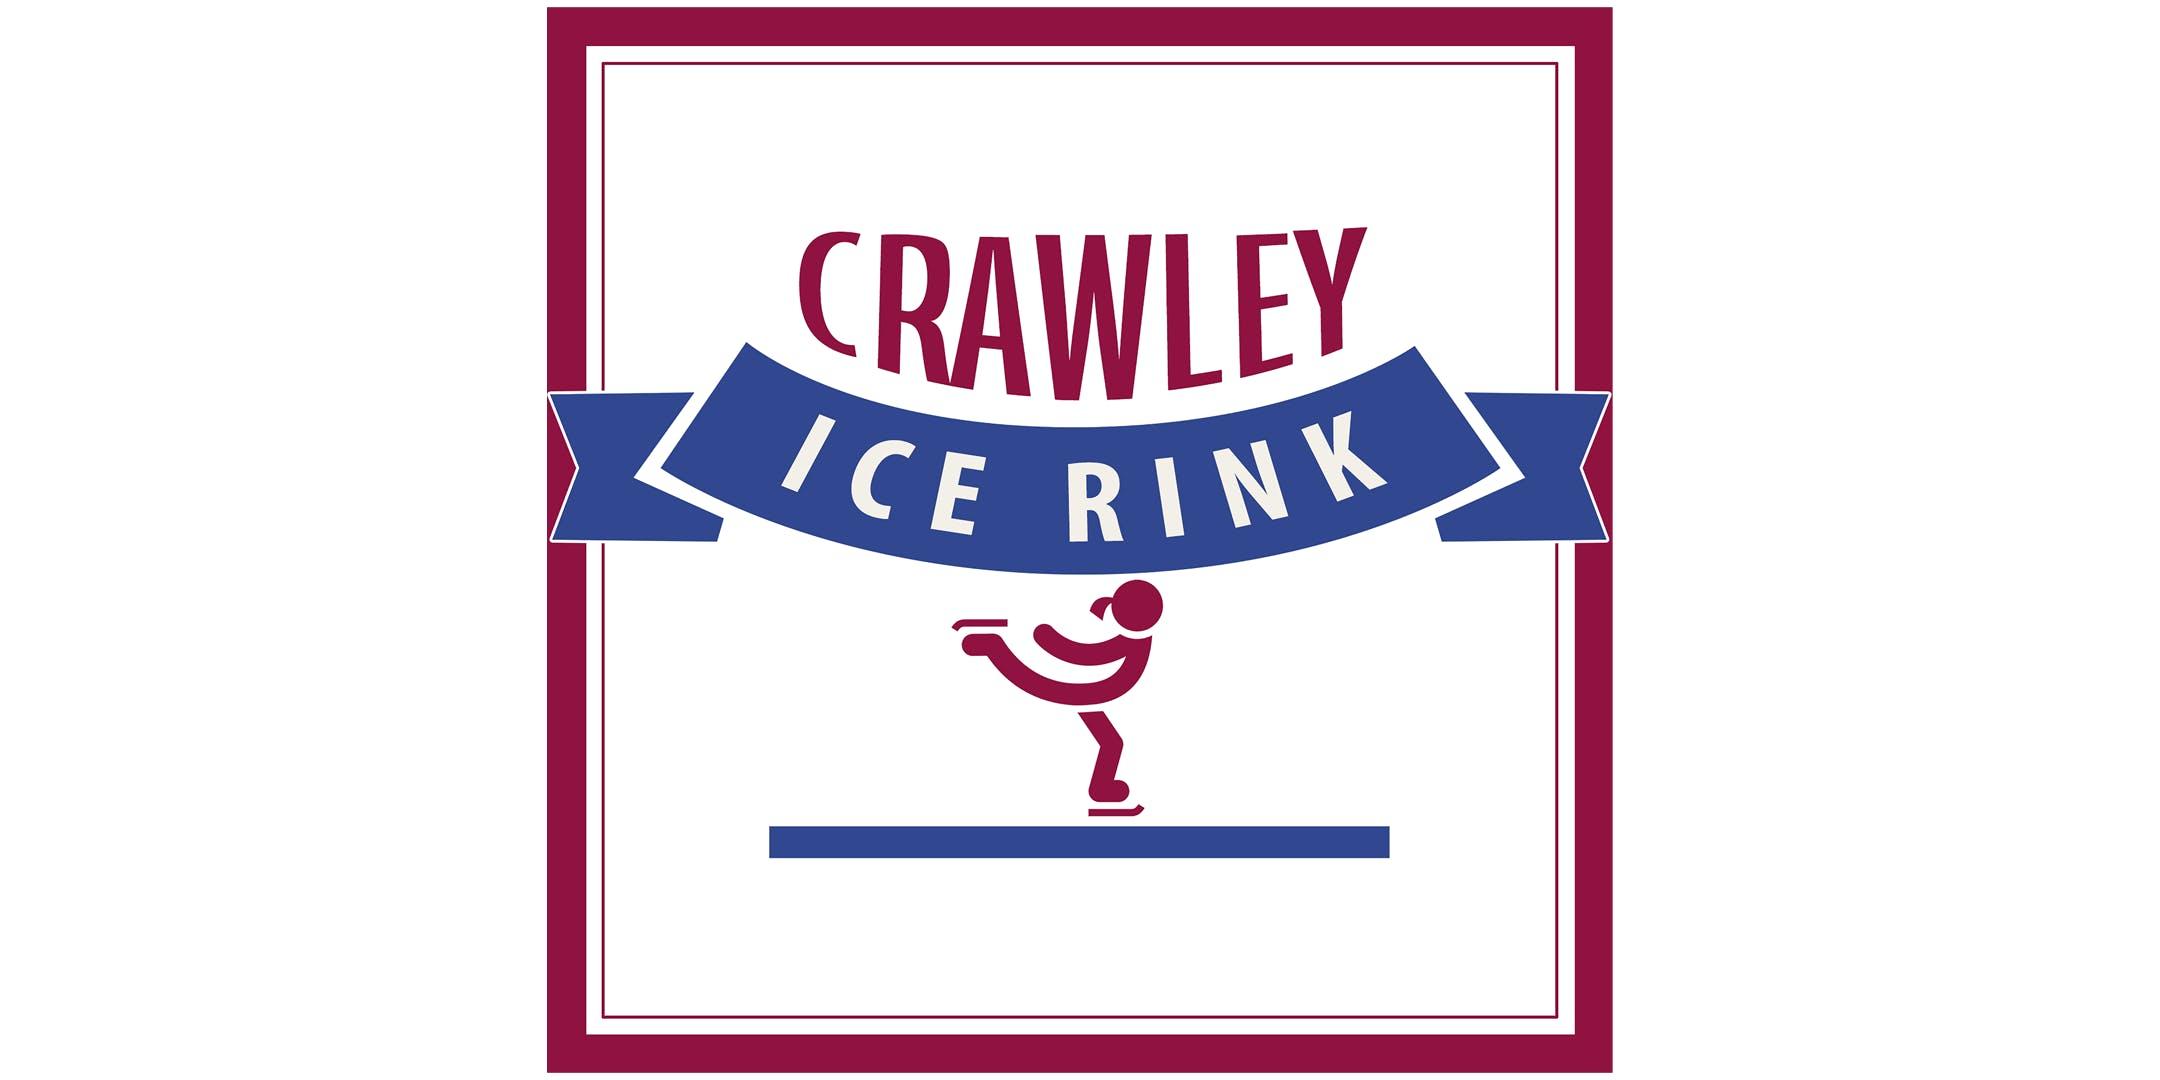 Crawley Ice Rink - December Pre Xmas (1st-24t